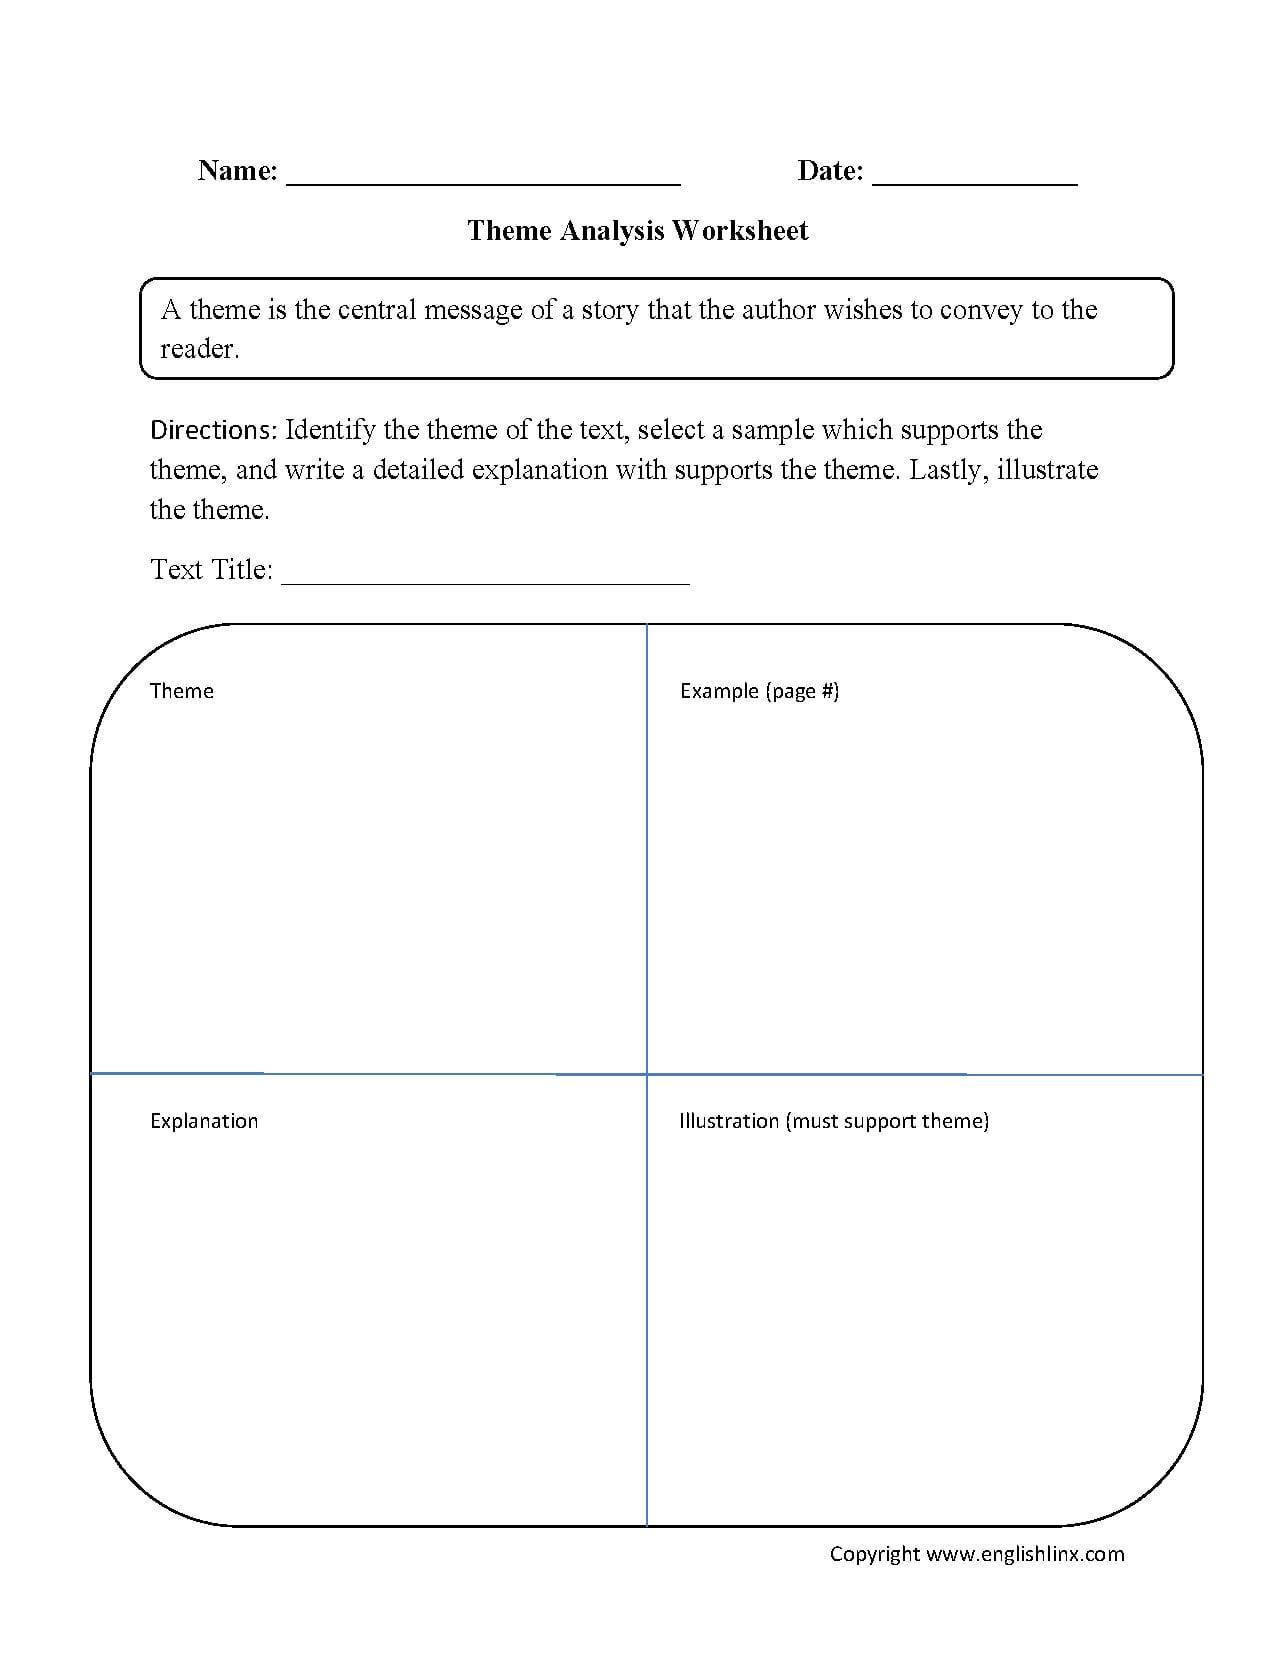 Englishlinx  Theme Worksheets Regarding Theme Worksheets 4Th Grade